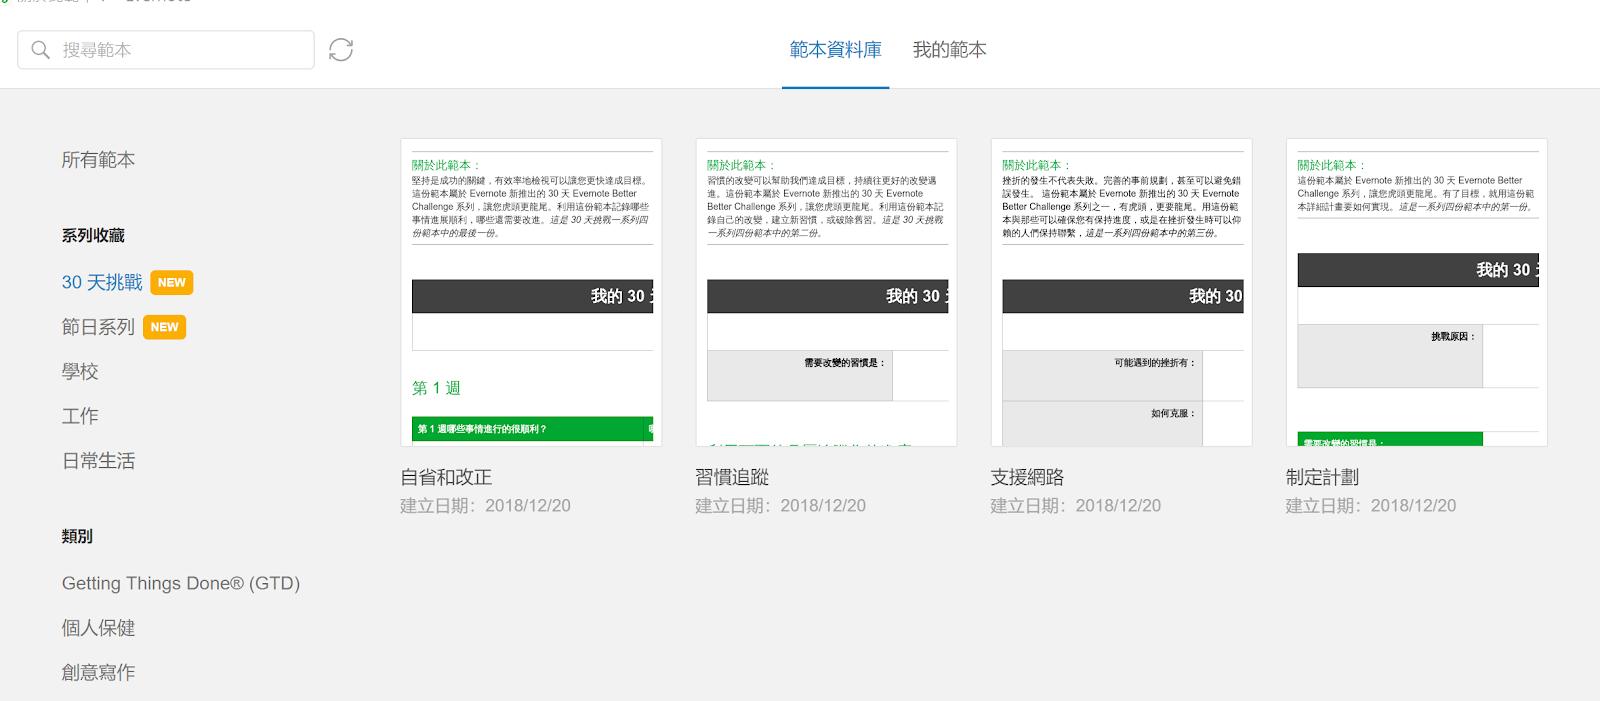 Evernote 免費版也能用的大量中文筆記範本,寫筆記一鍵套用